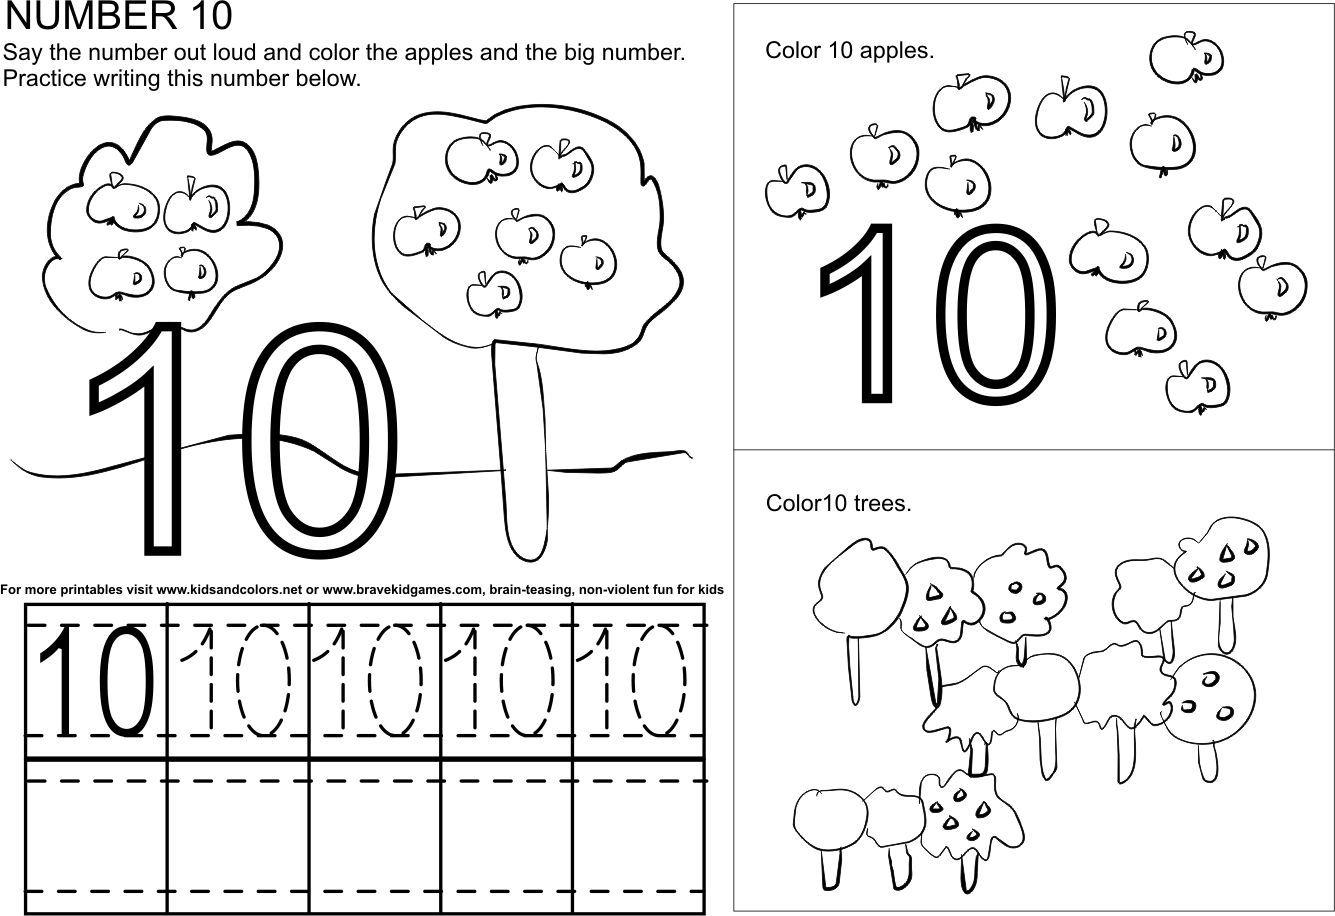 Image Result For No 10 Worksheet Numbers Preschool Number 10 Preschool Worksheets